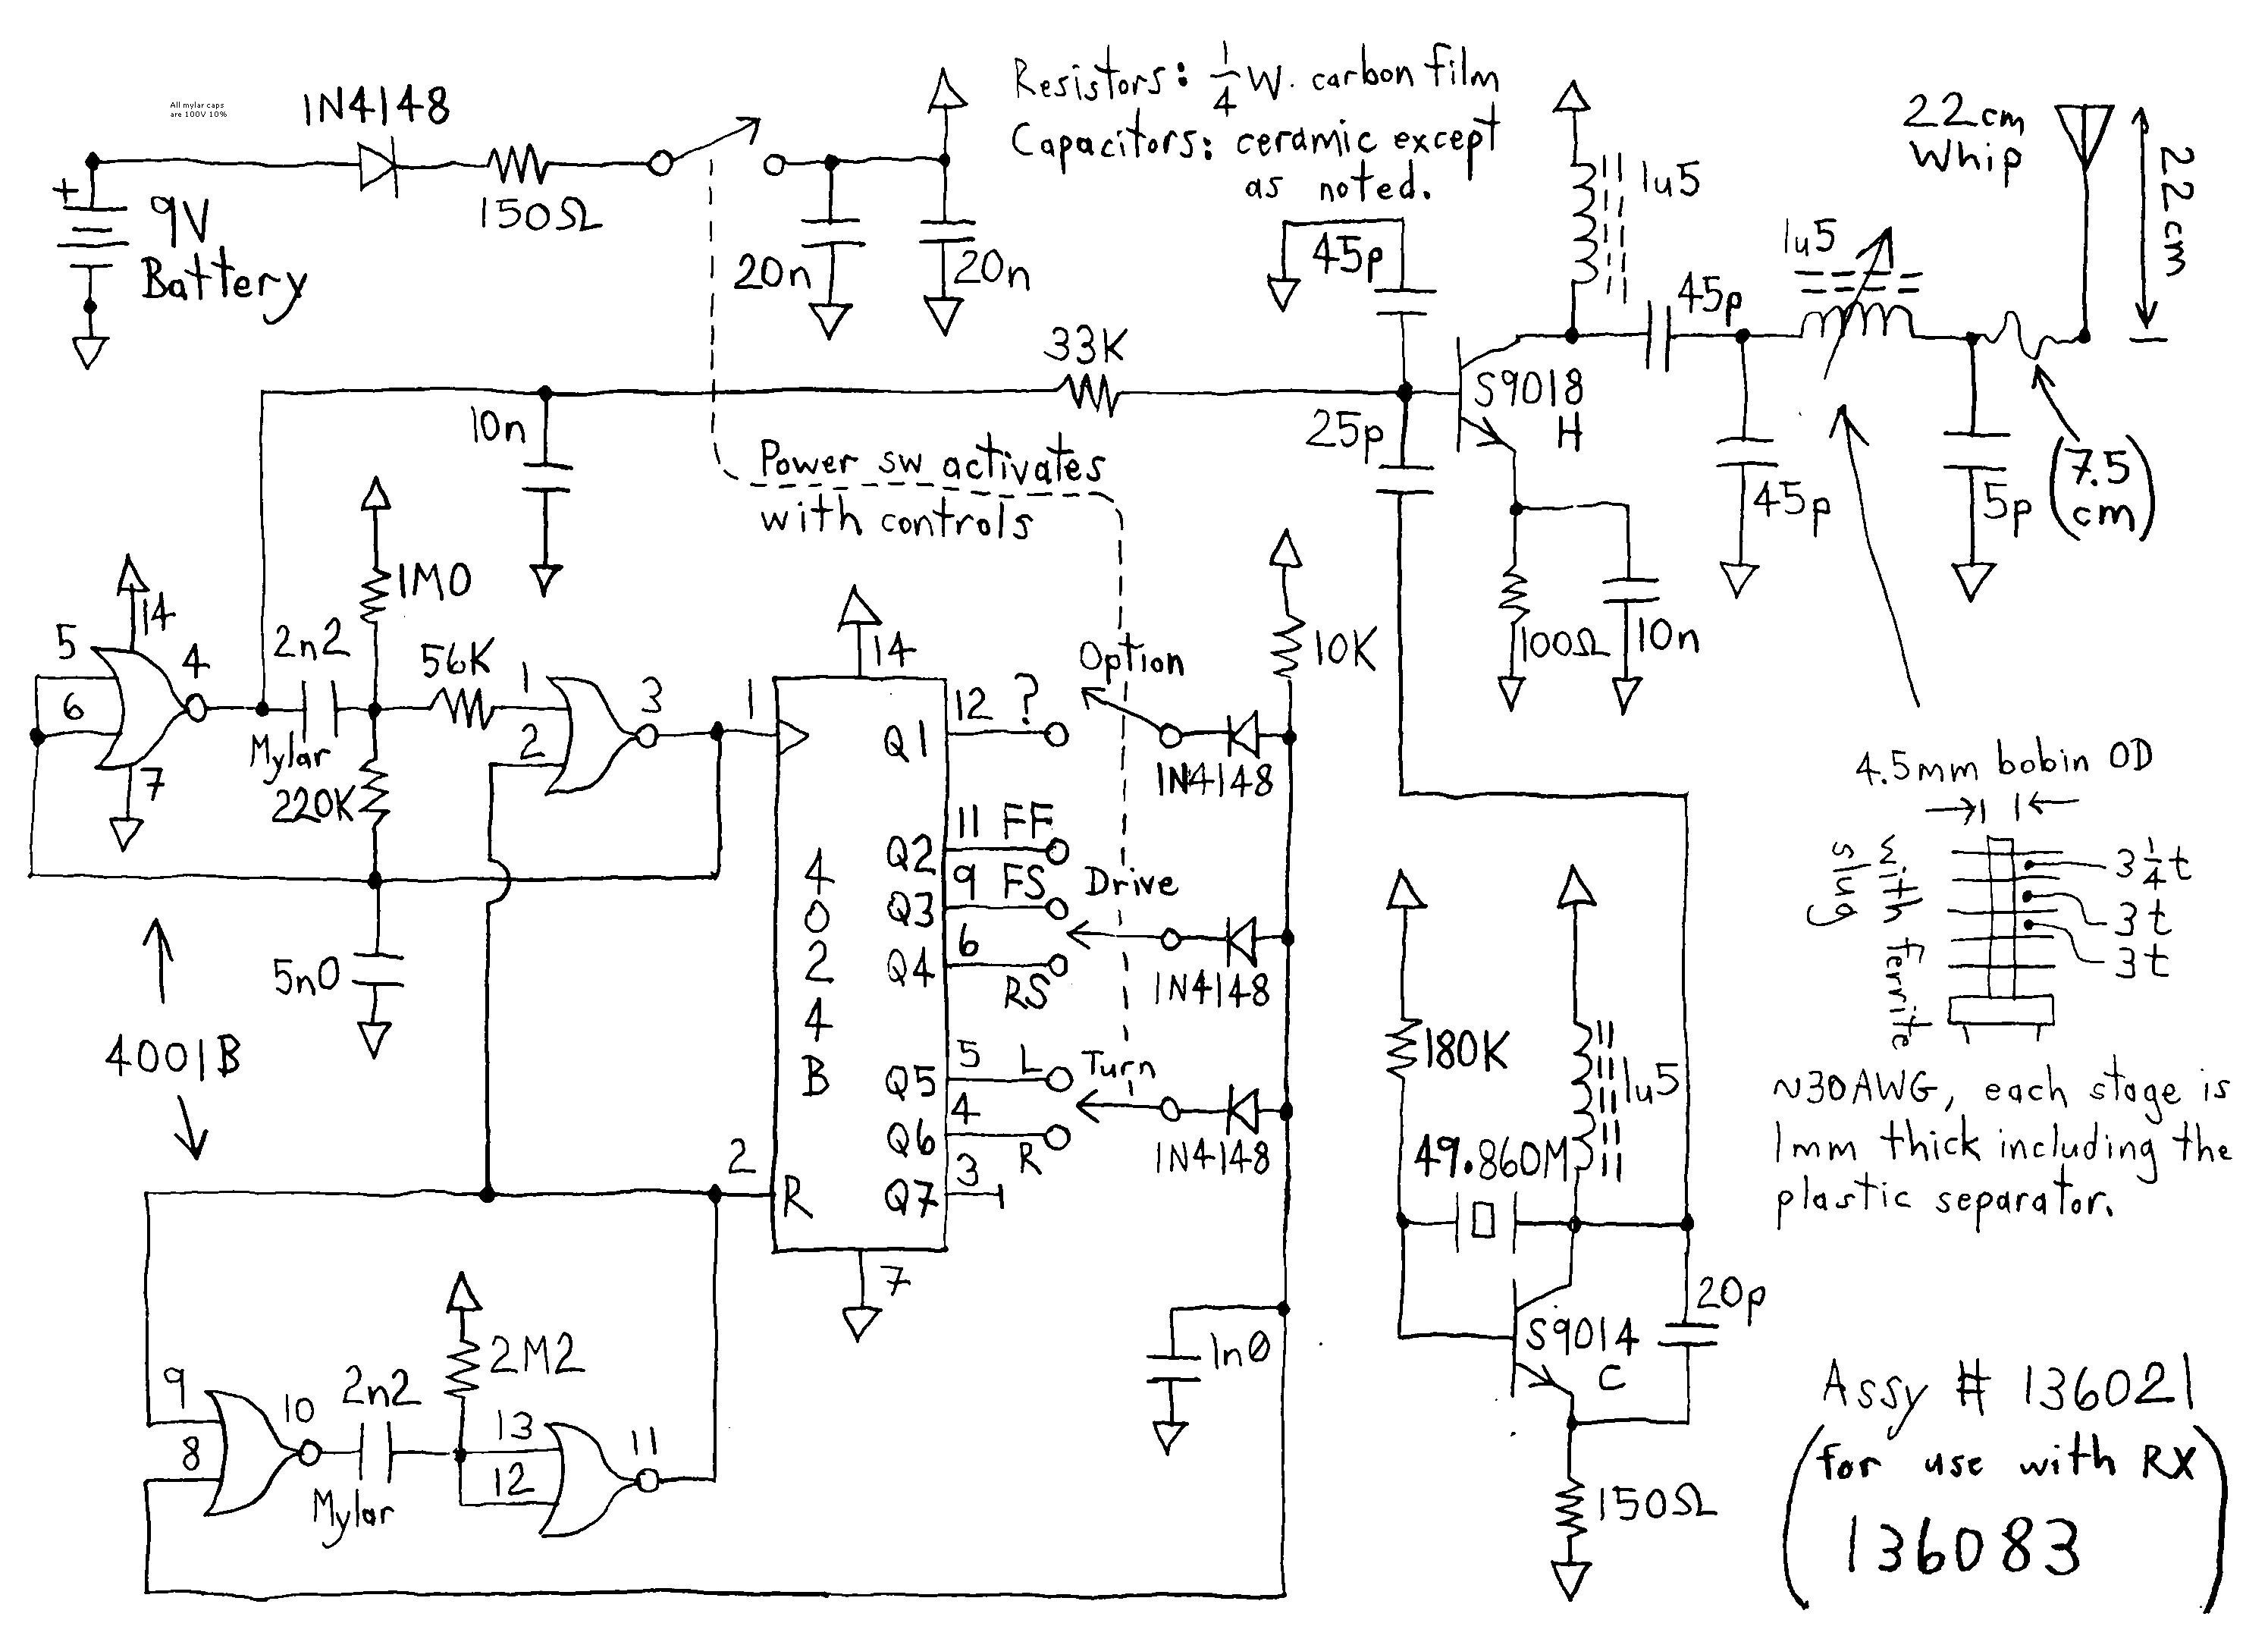 Amp Wiring Diagram Car 2 Post Car Lift Wiring Diagram Of Amp Wiring Diagram Car